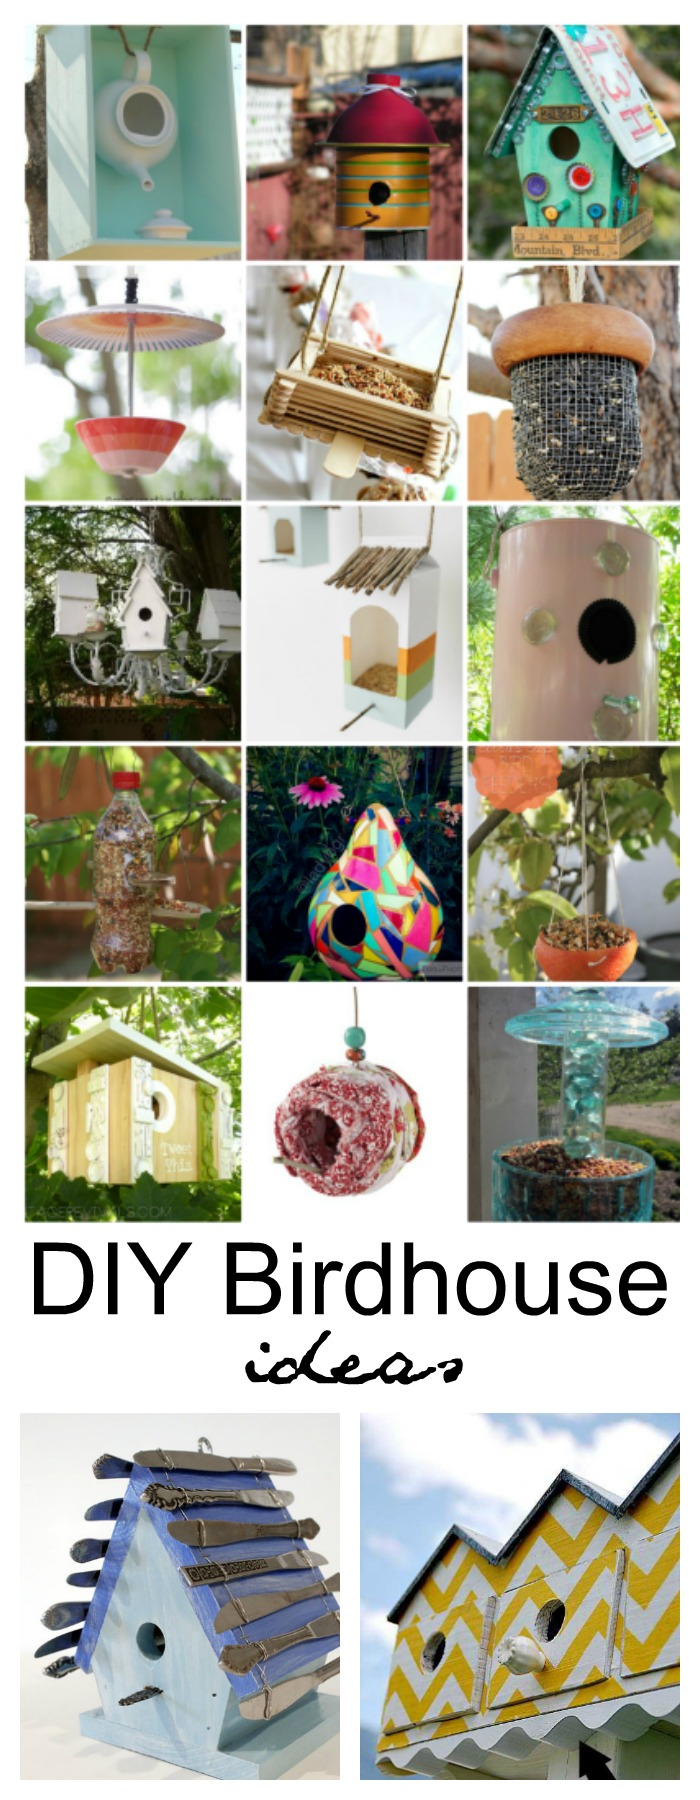 DIY-Birdhouse-Ideas-Pin